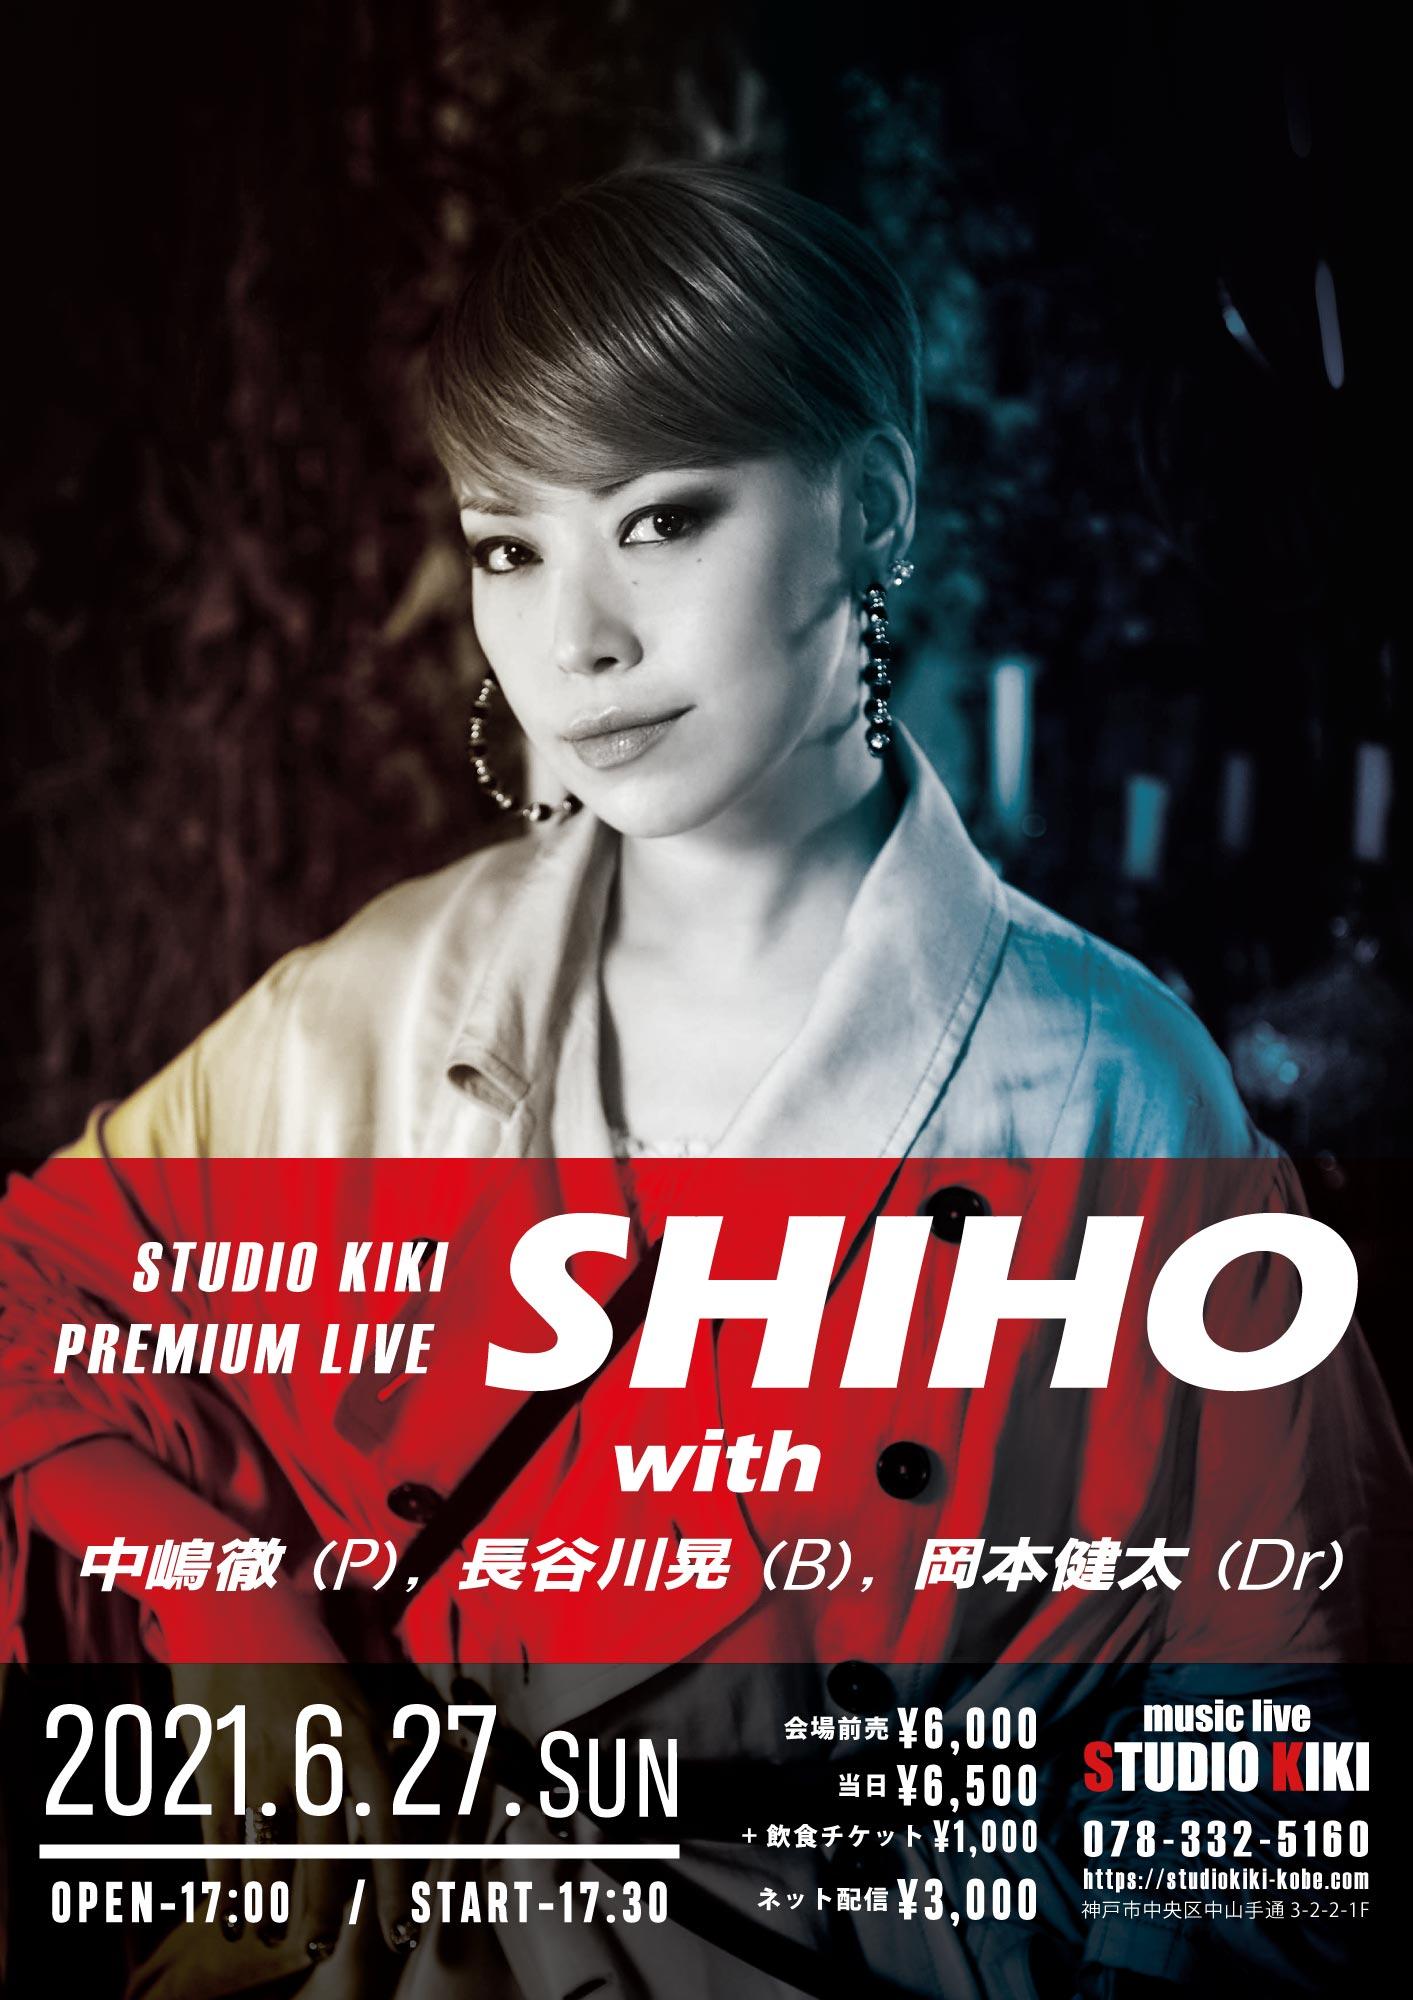 2021.6.27(Sun) Shiho ONLINE LIVE